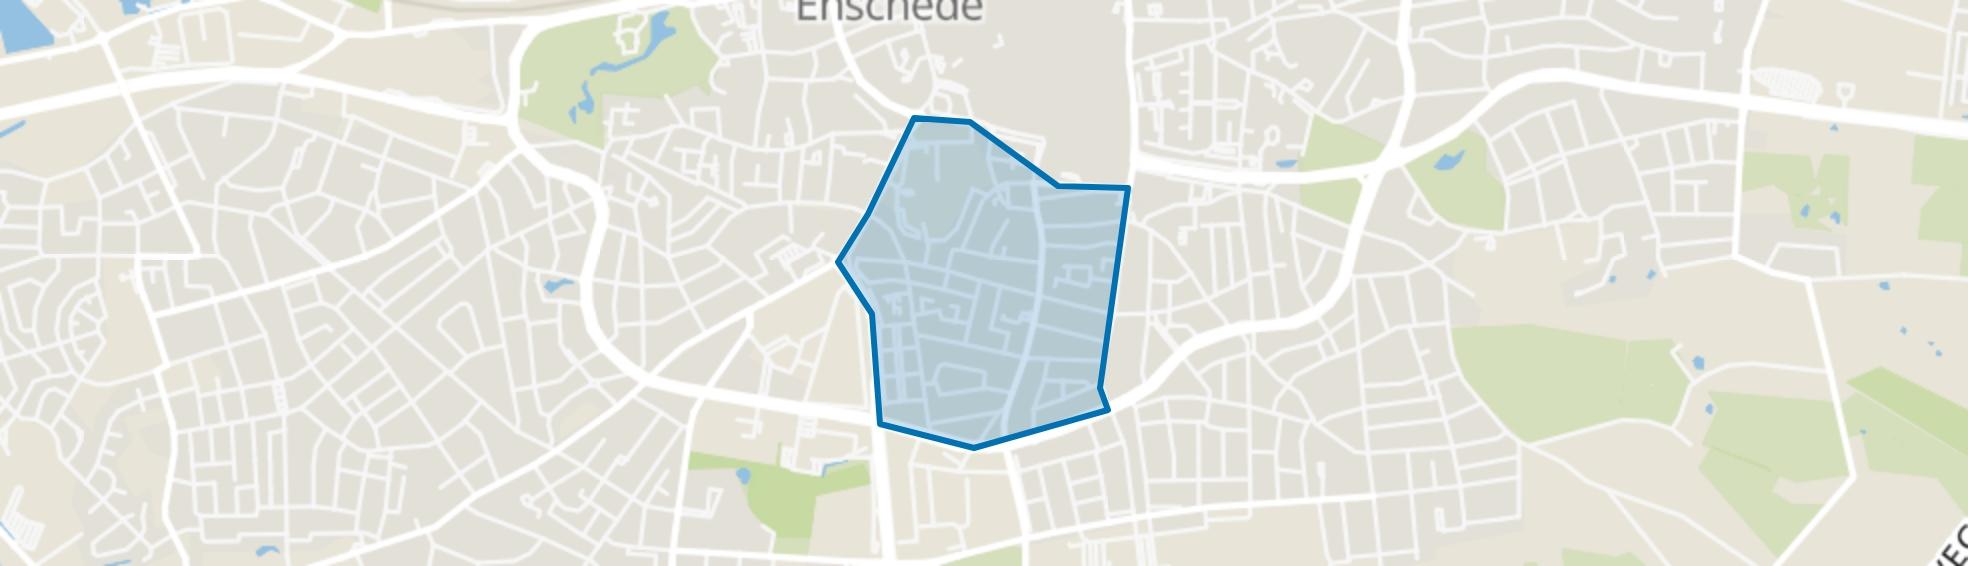 Getfert, Enschede map